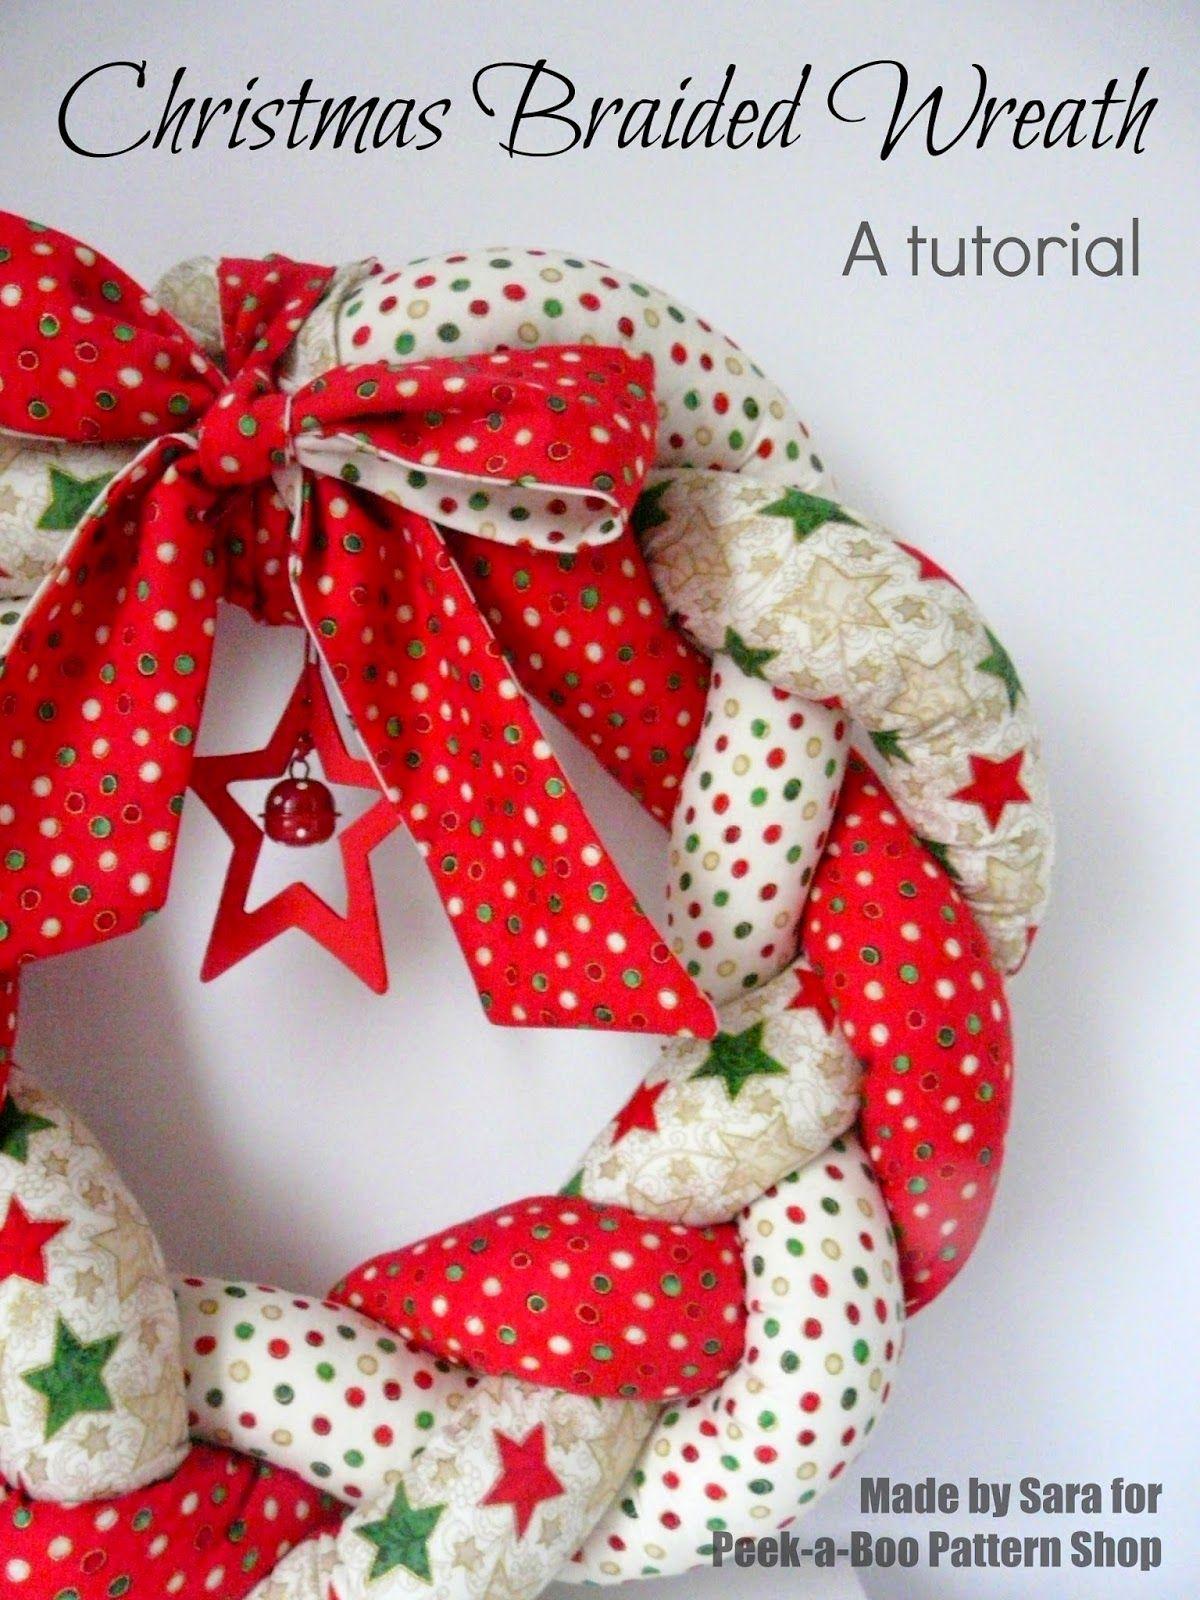 Christmas Braided Wreath - a tutorial | Pinterest | Nähprojekte ...